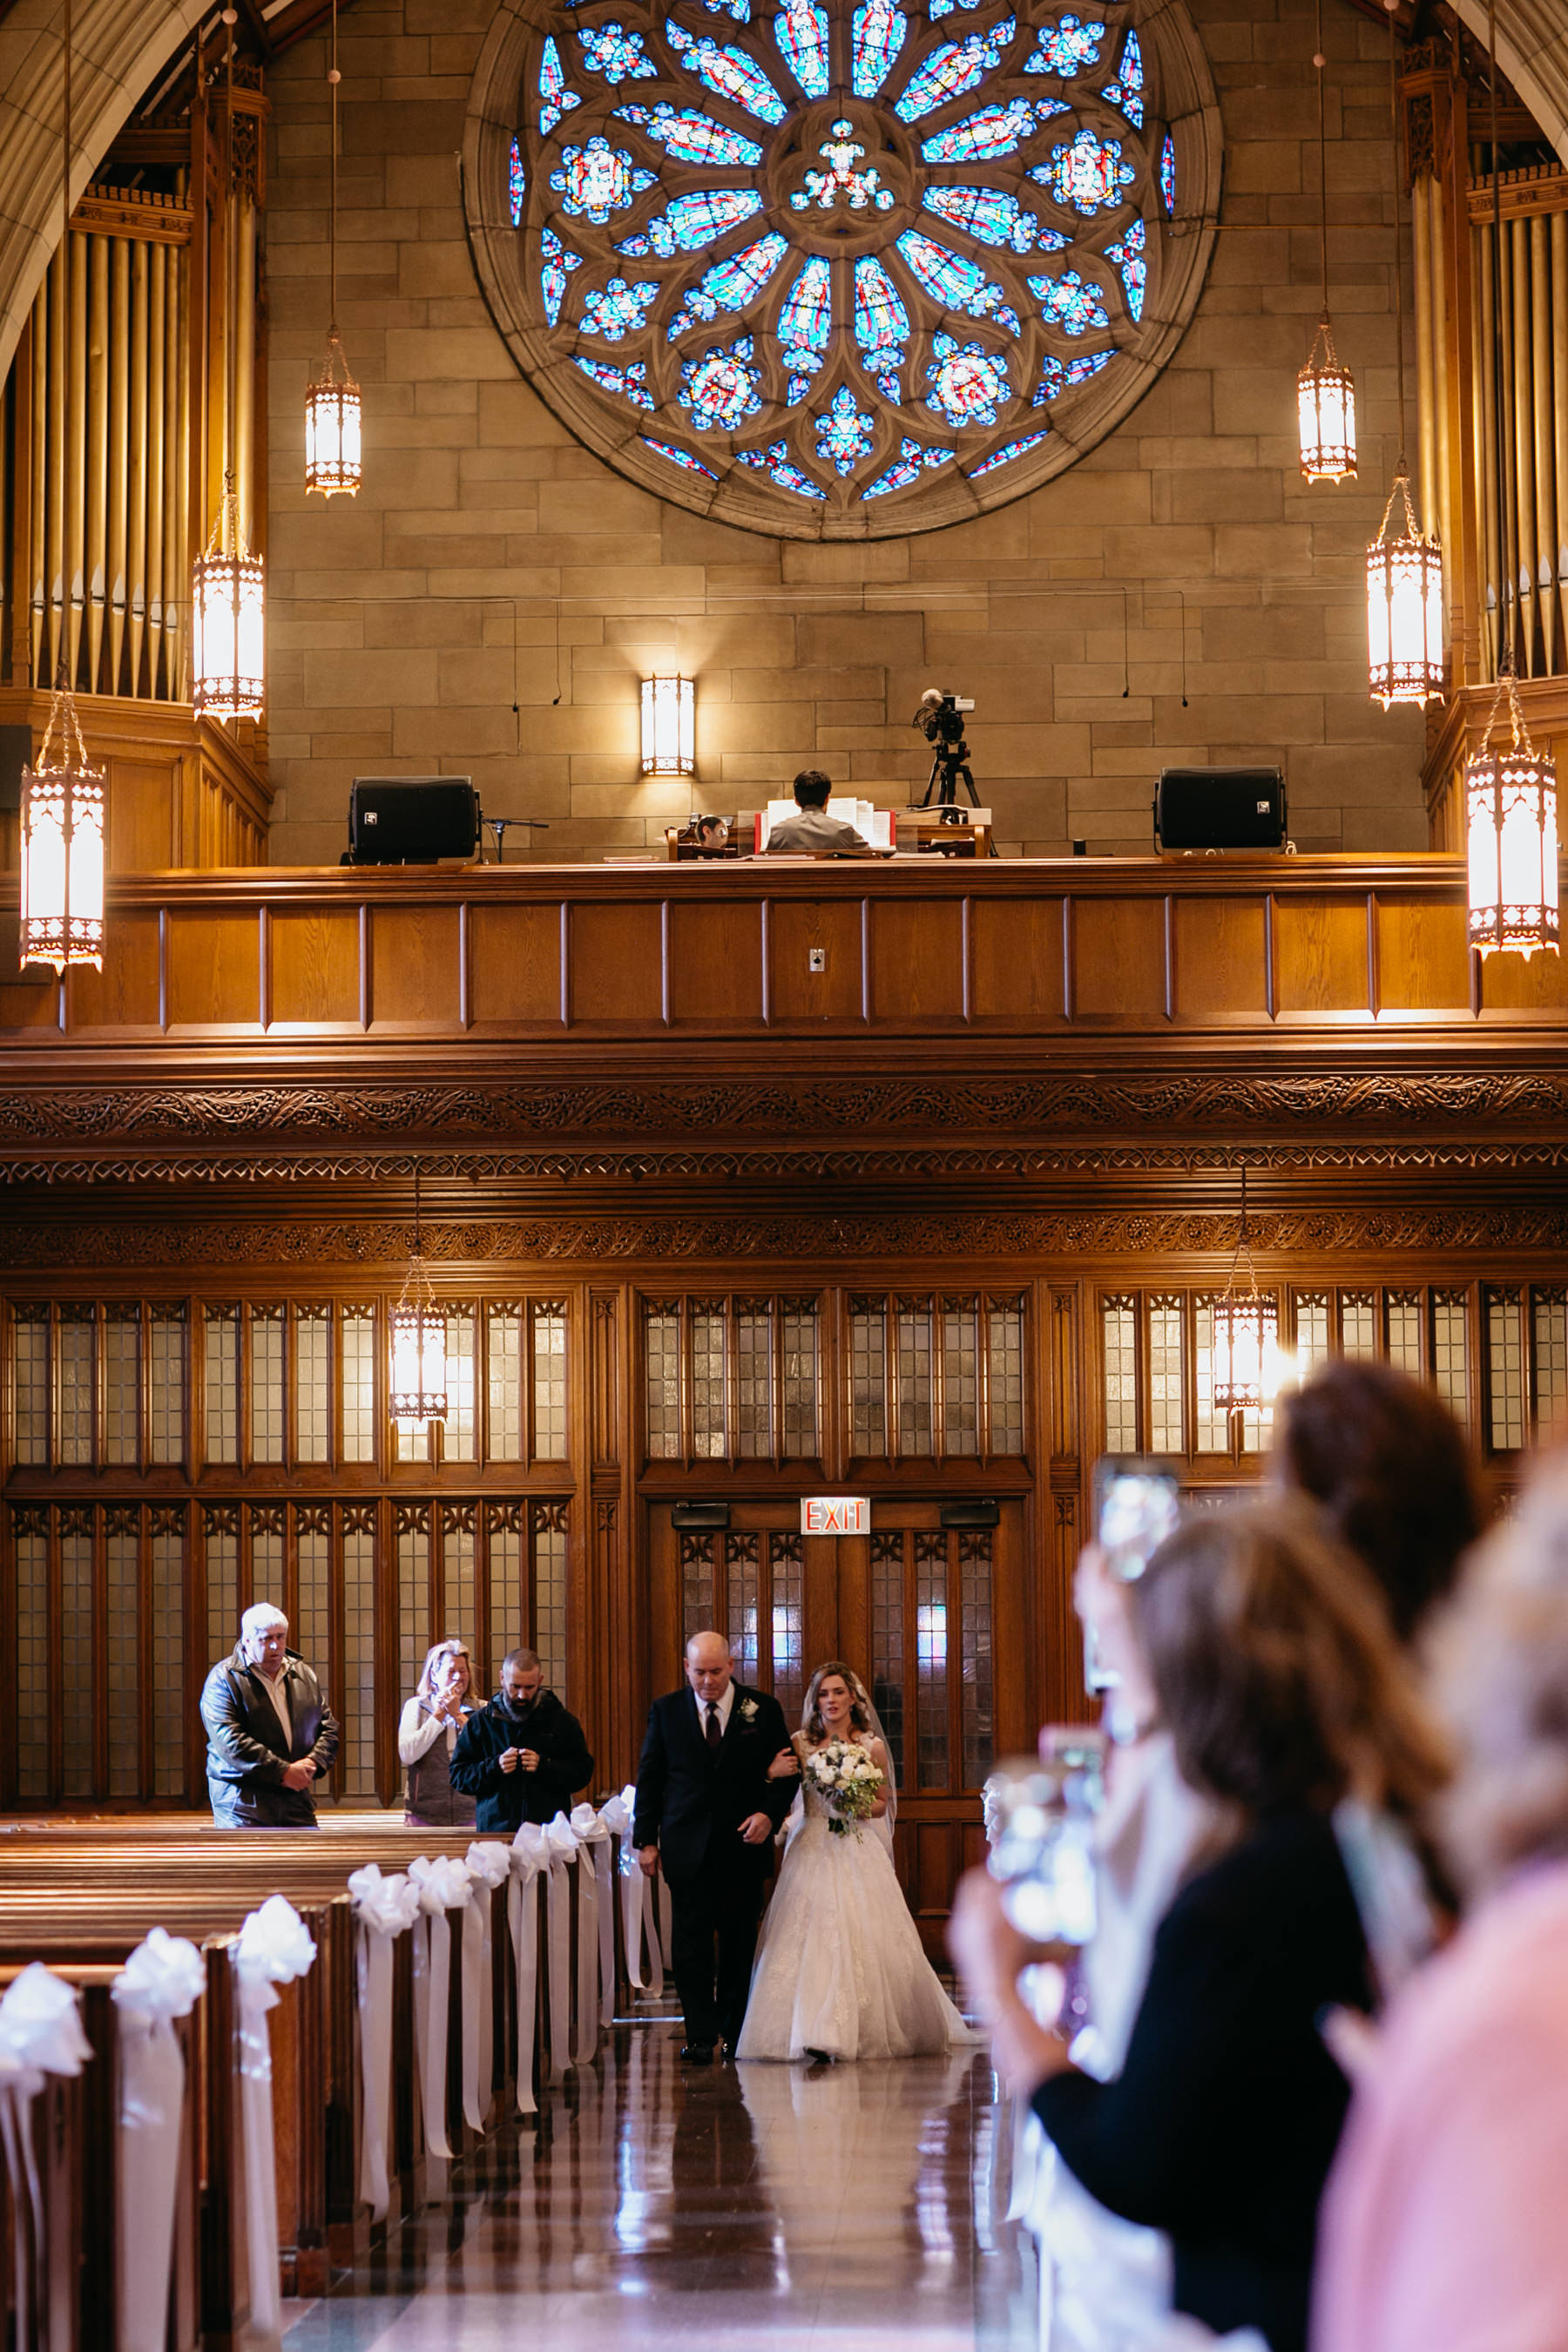 Quincy Ma Massachusetts Wedding Dedham Boston Granie Links Wedding New England Catholic Cathedral Liz Osban Photography 37.jpg